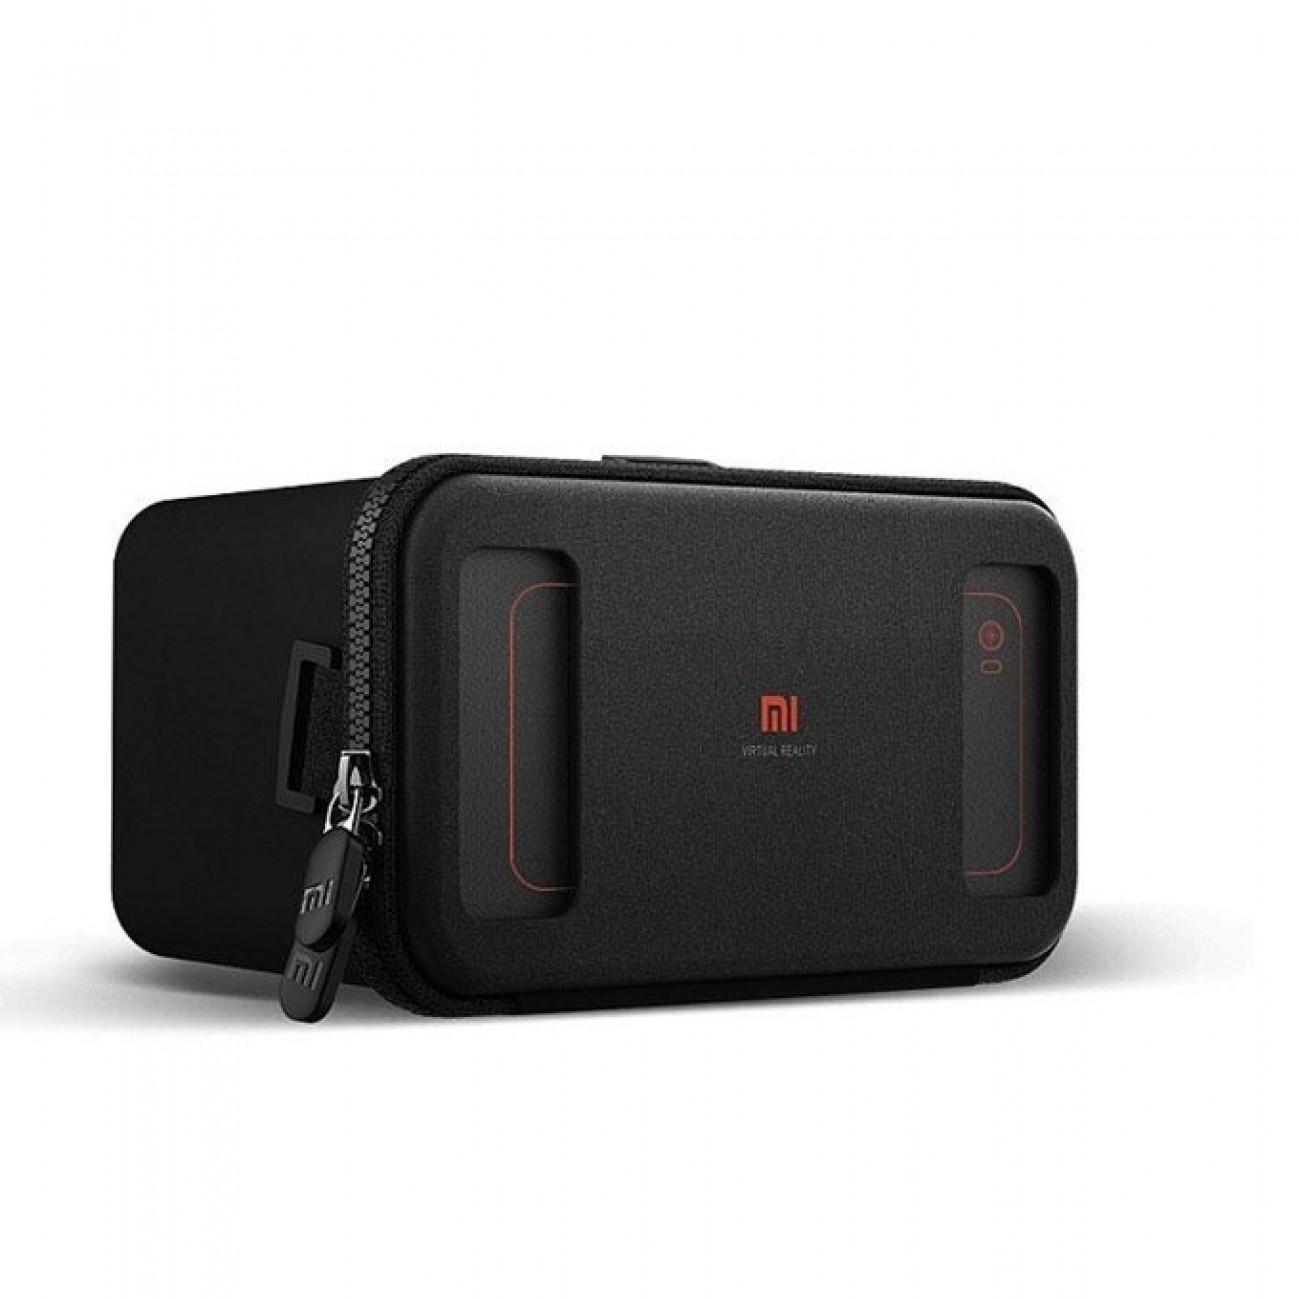 Очила за виртуална реалност Xiaomi Mi VR Play, за смартфони 4,5-5,7, черни в VR (Виртуална реалност) - Xiaomi | Alleop